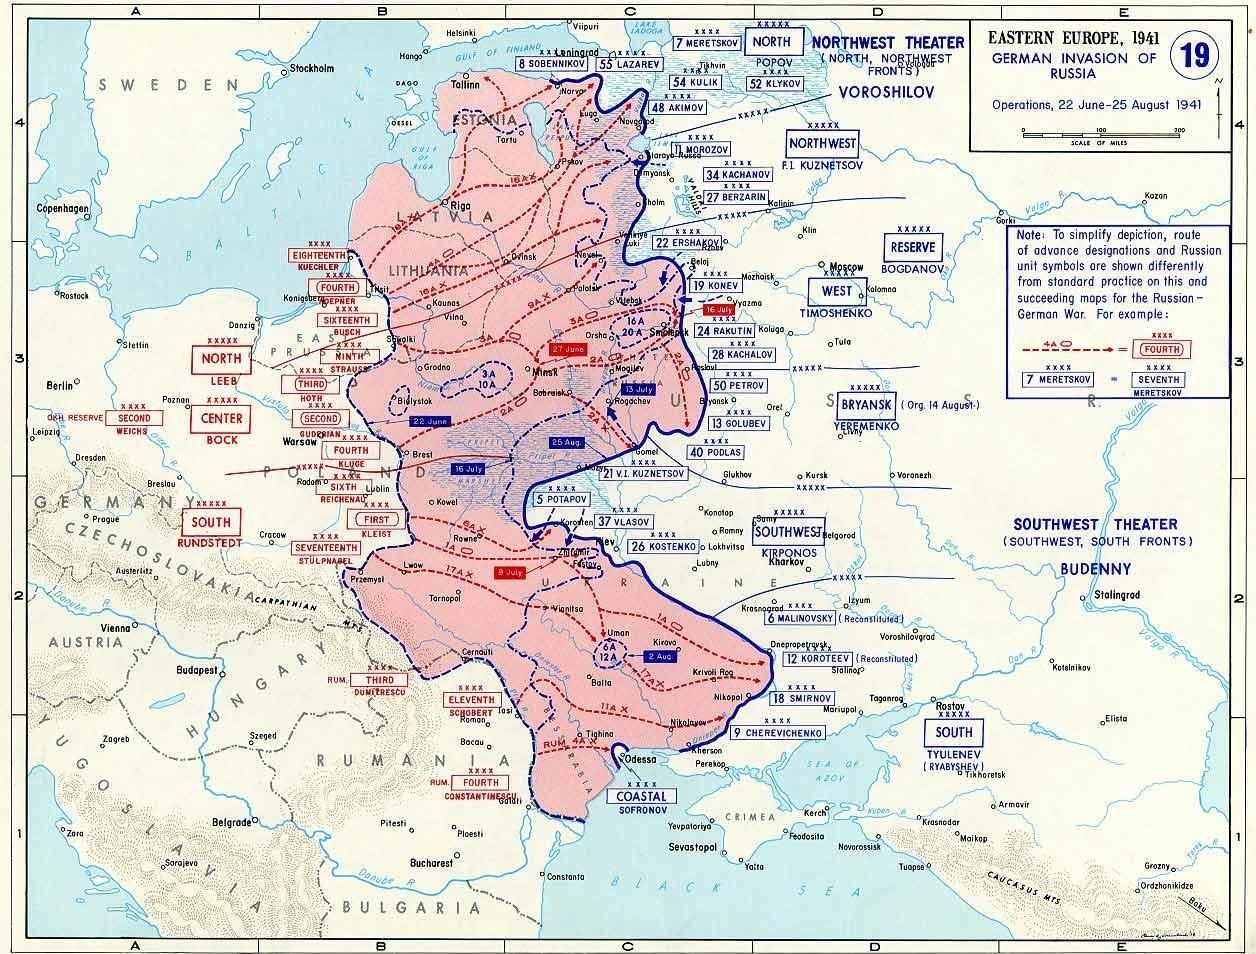 Avancée allemande en 1941